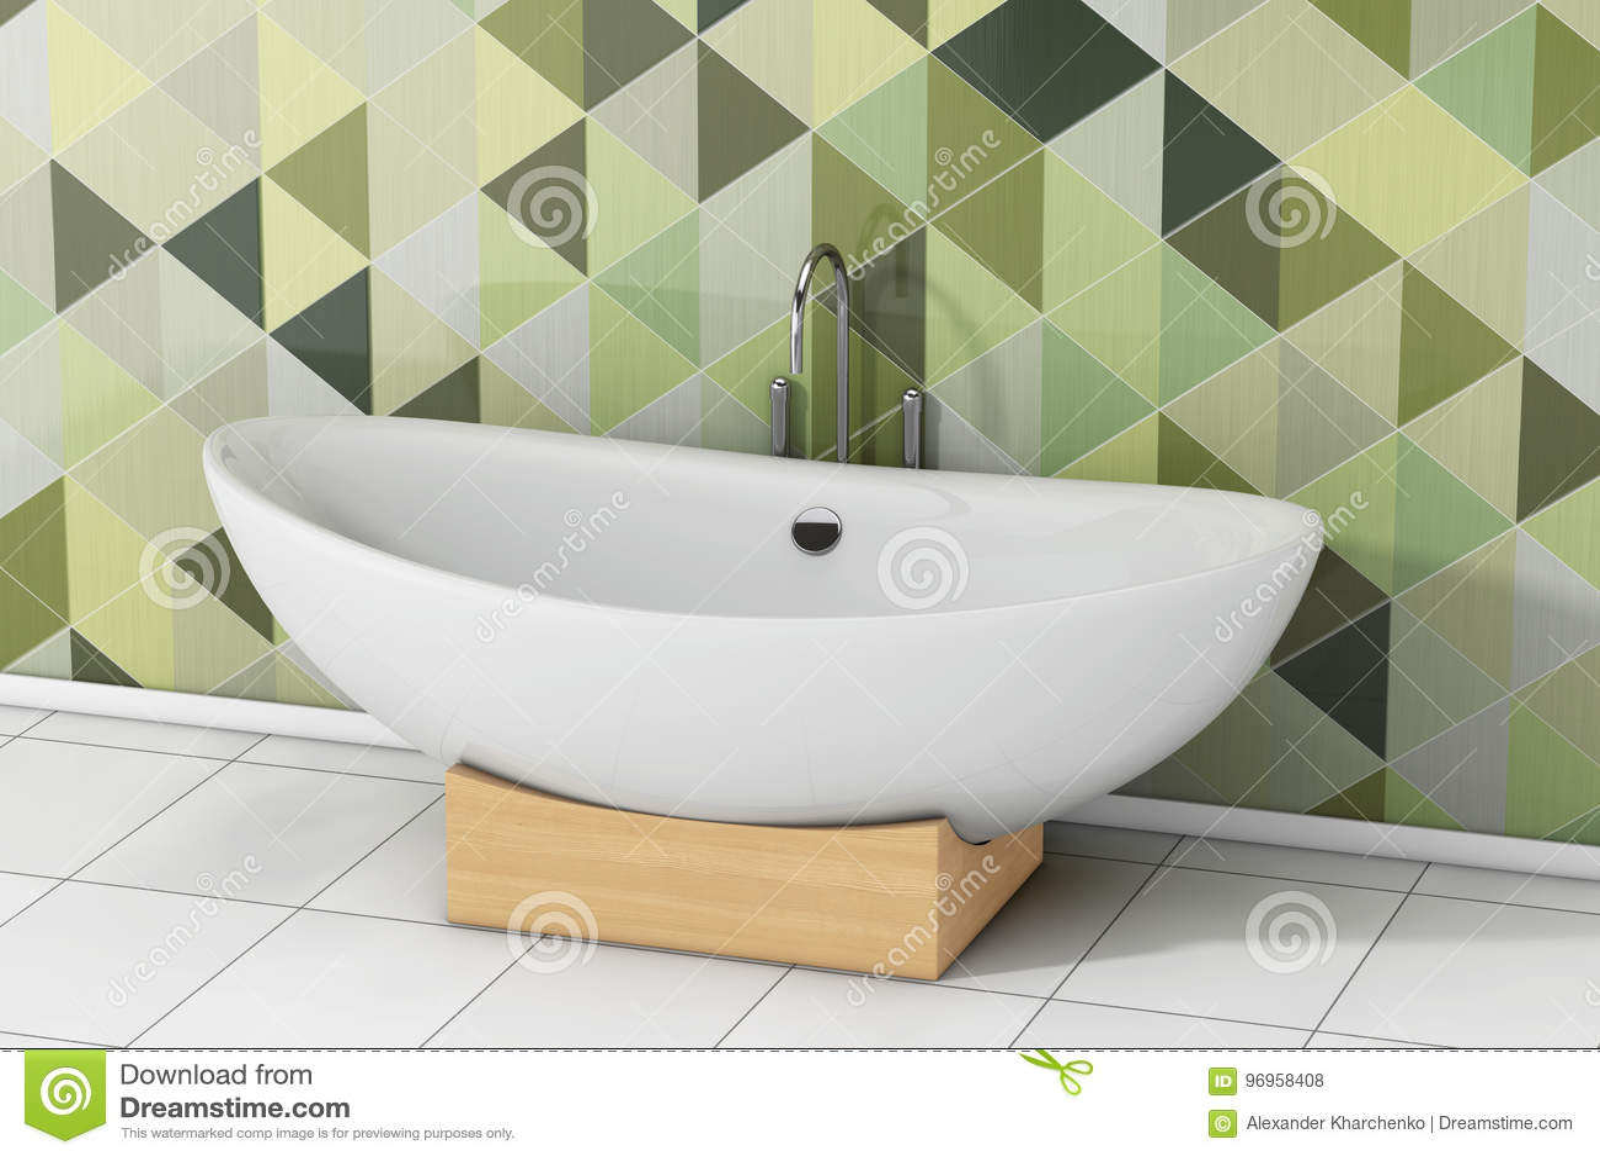 Modern White Bathtube In Front Of Olive Green Geometric Tiles In ...